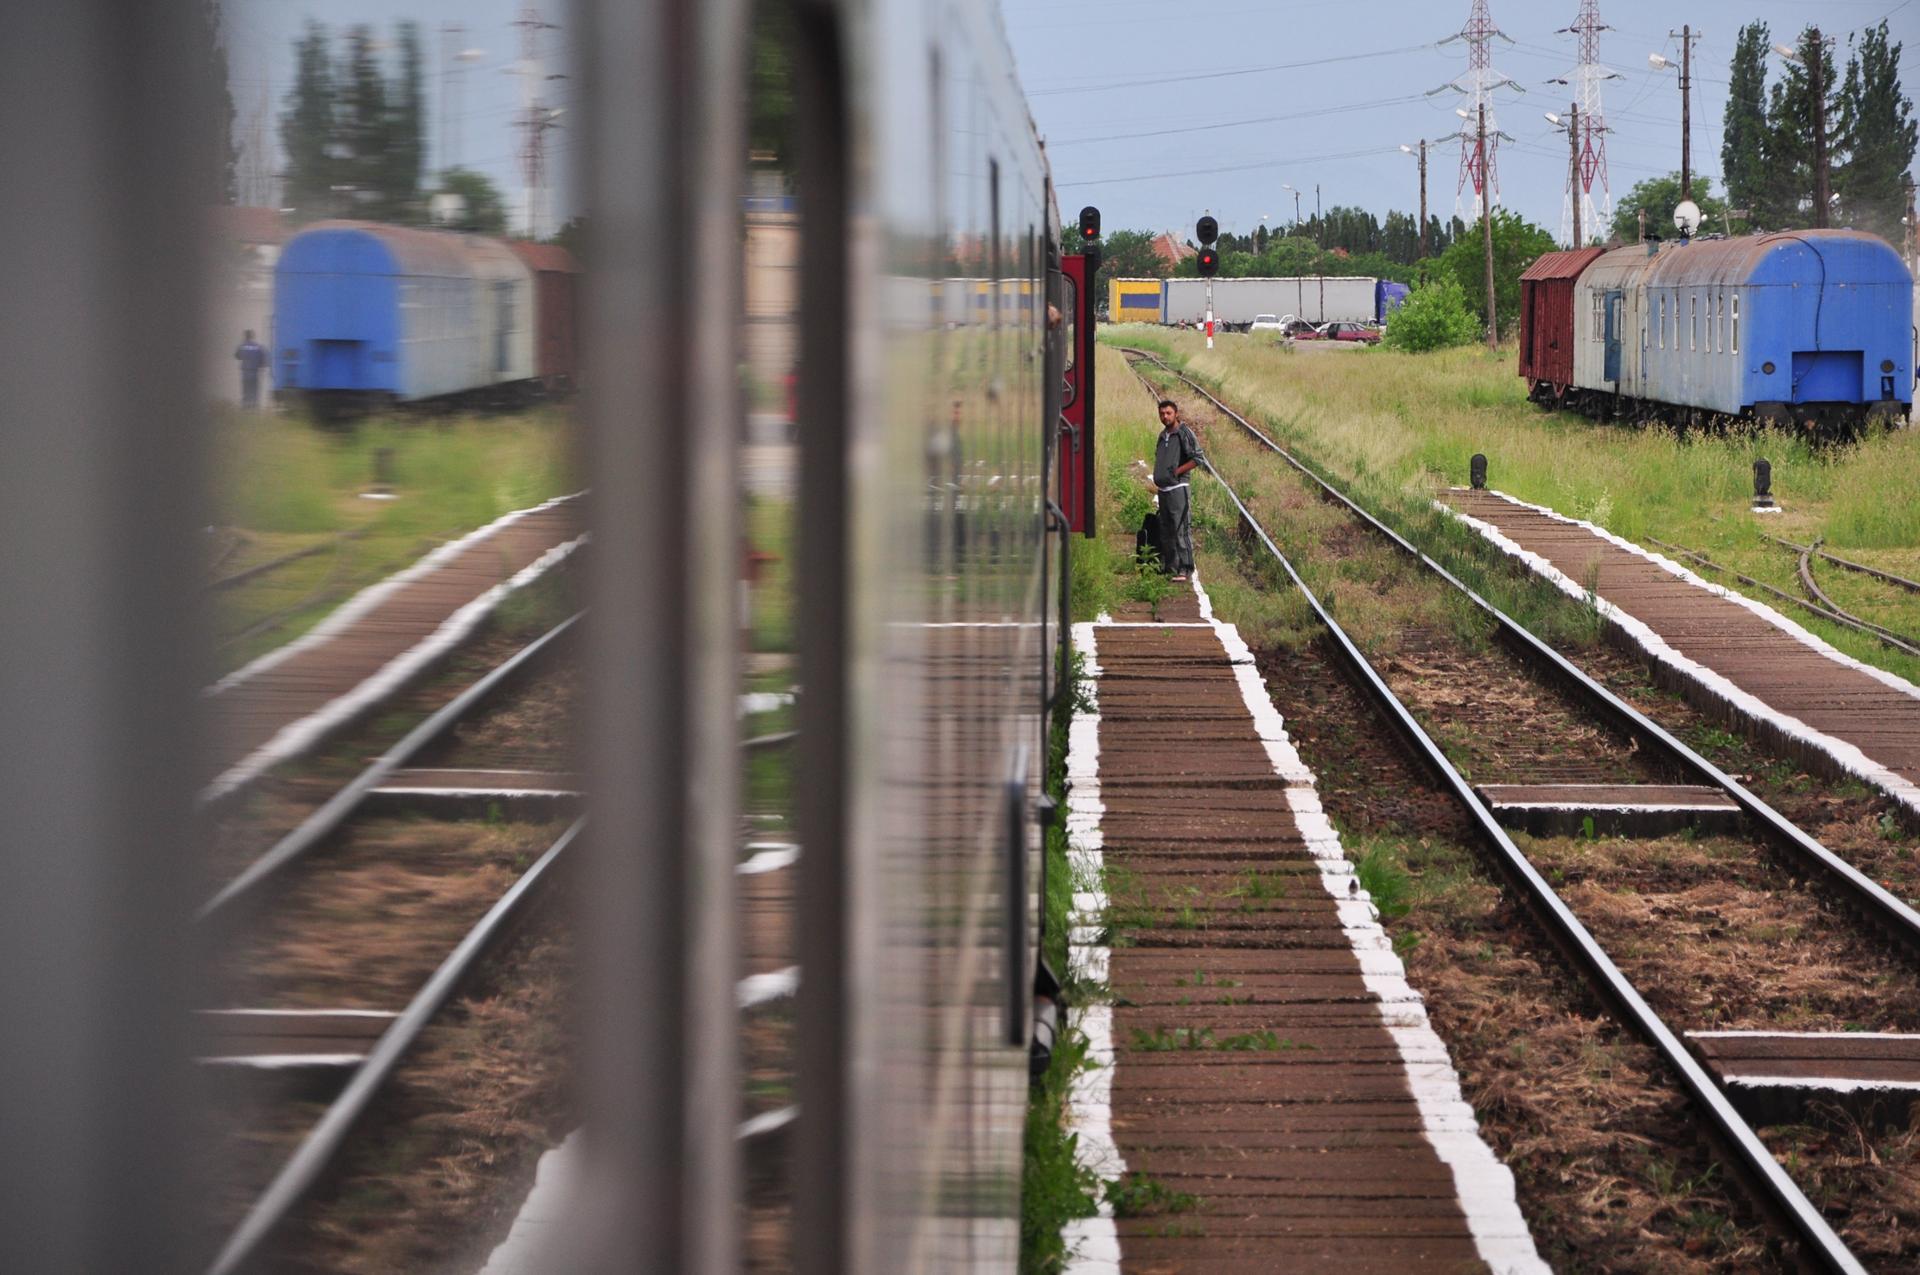 Romanian trains